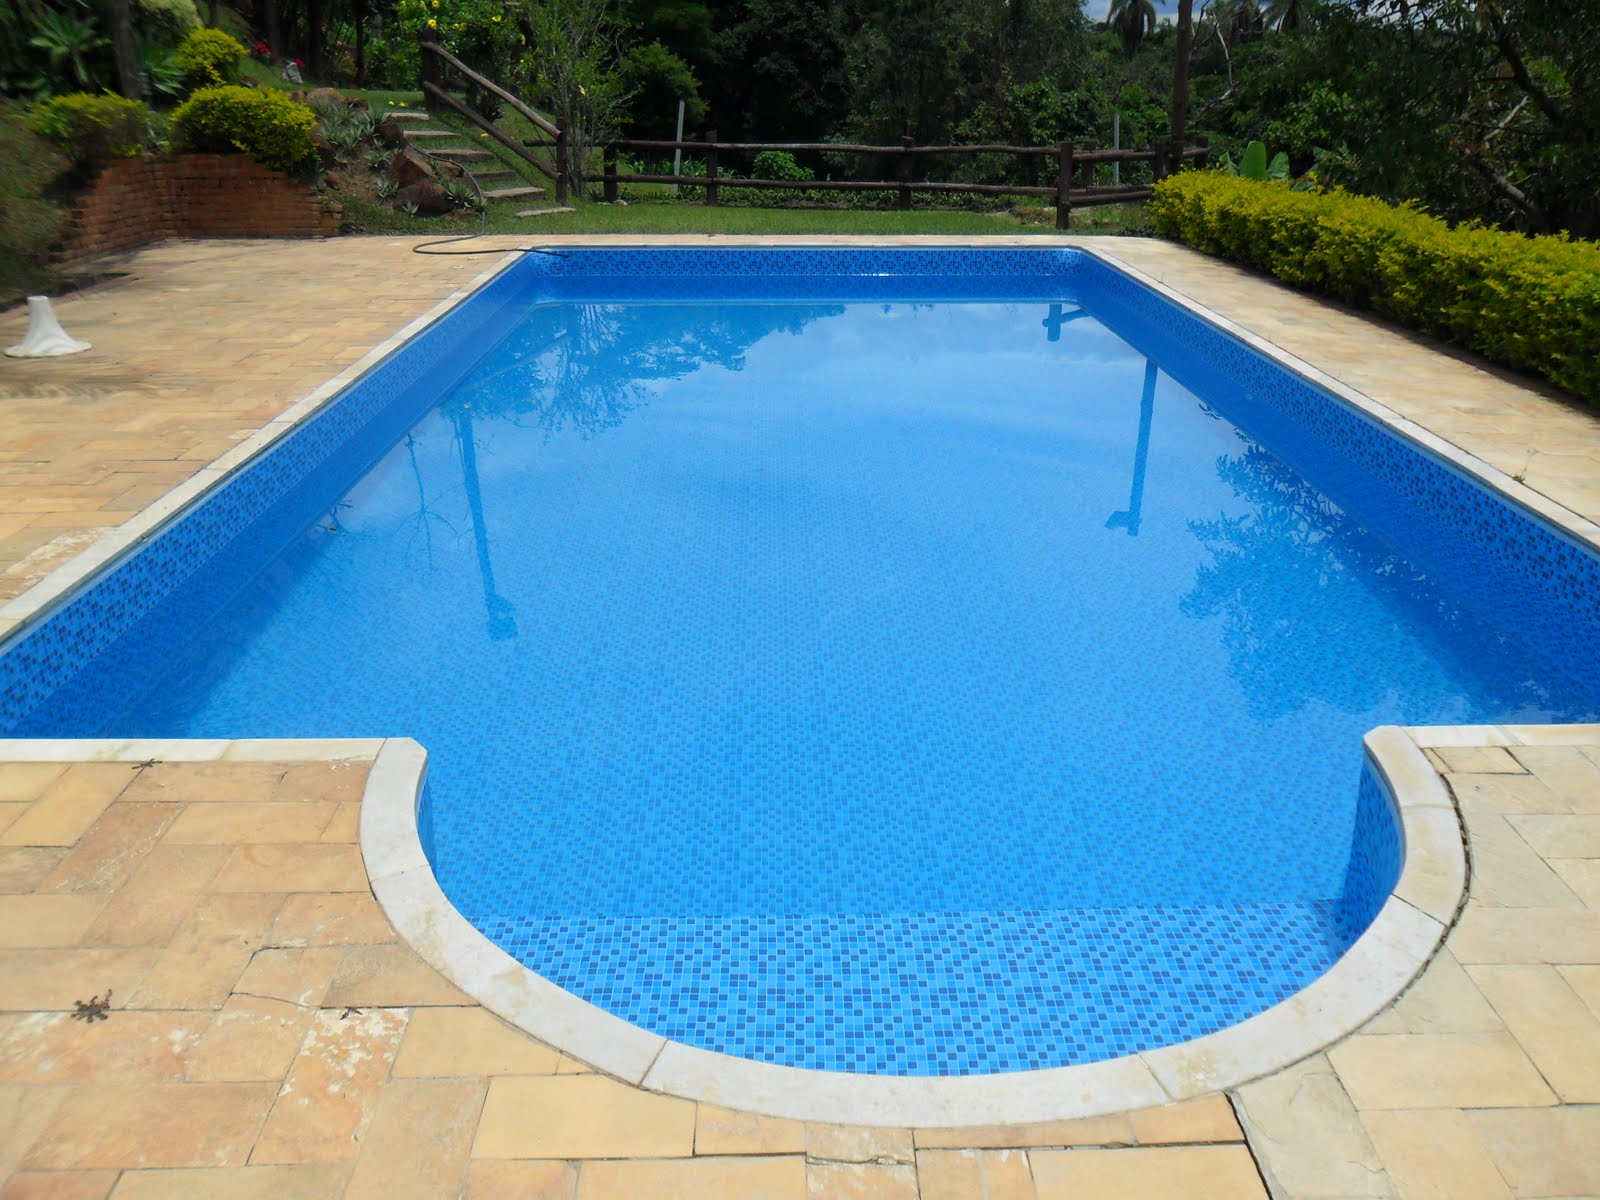 Fortal piscinas fotos de piscinas de vinil for De piscinas